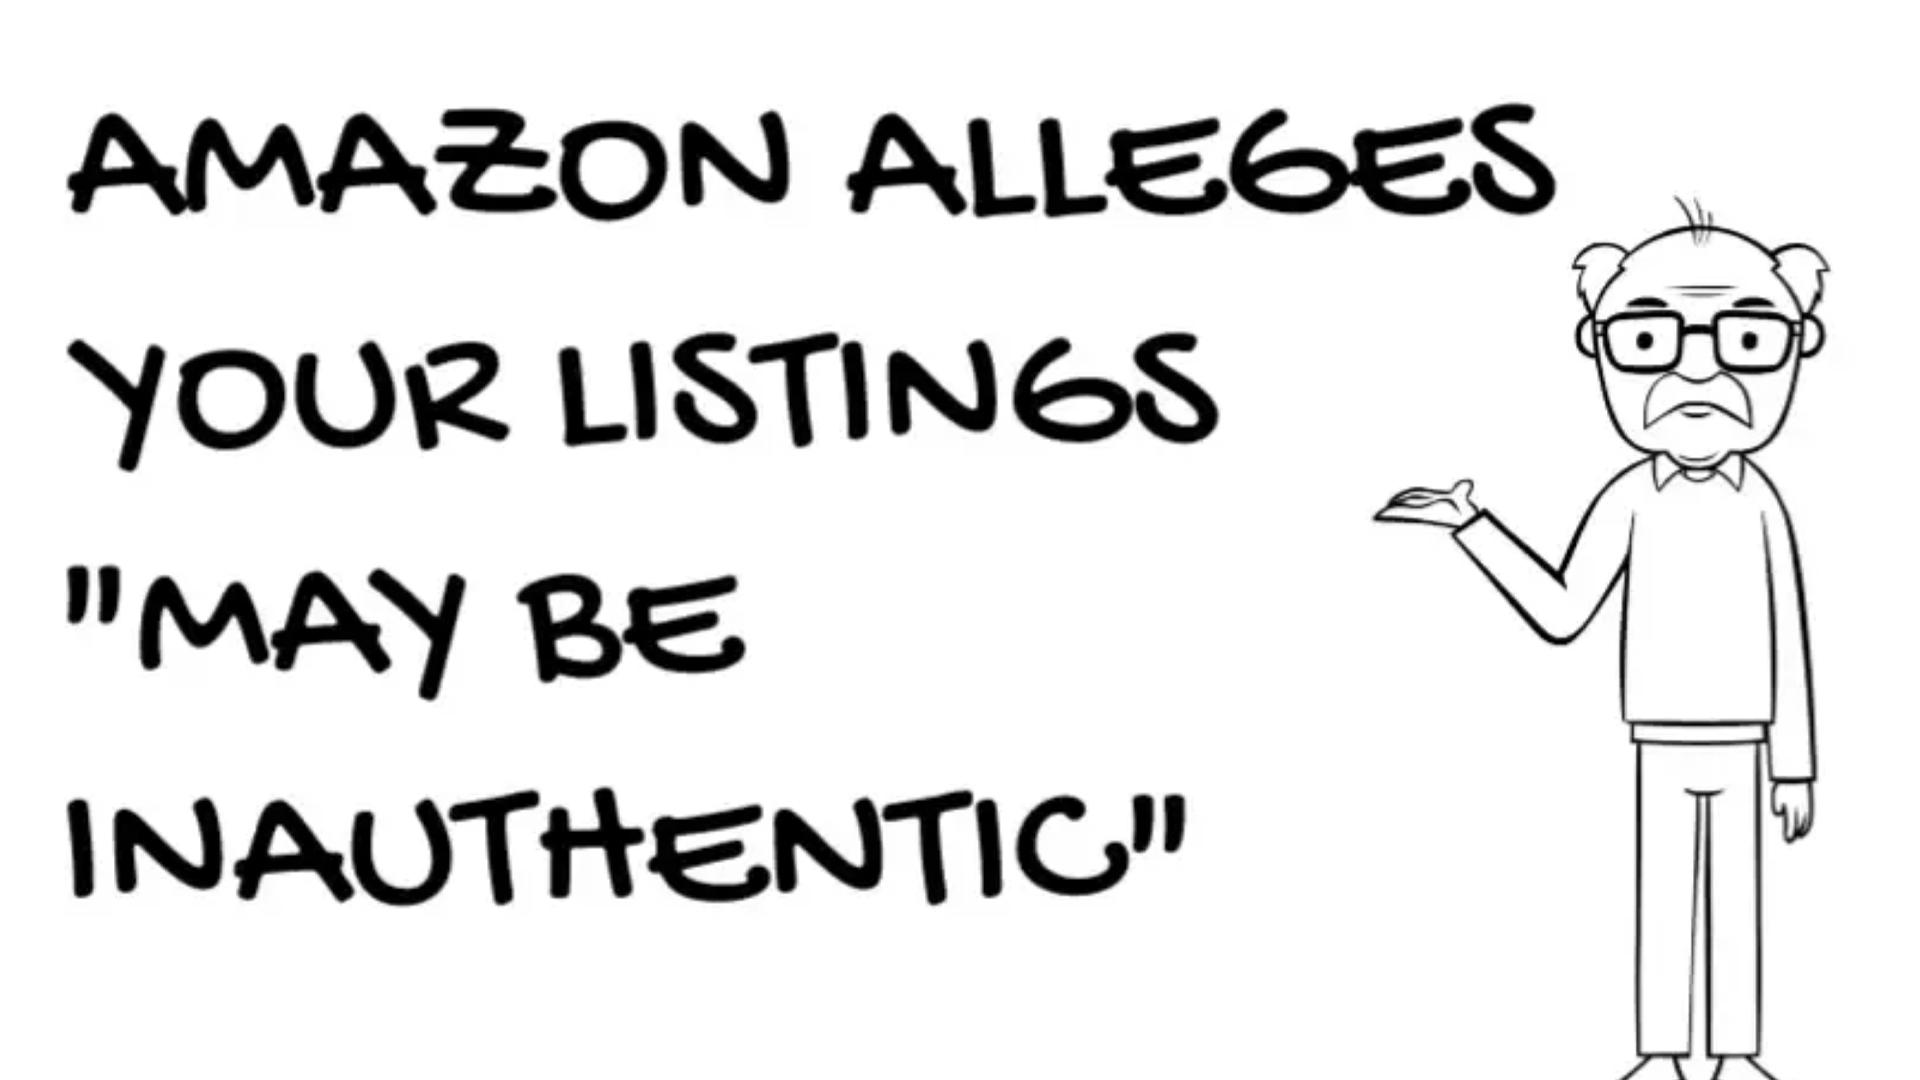 Inauthentic Suspensions on Amazon